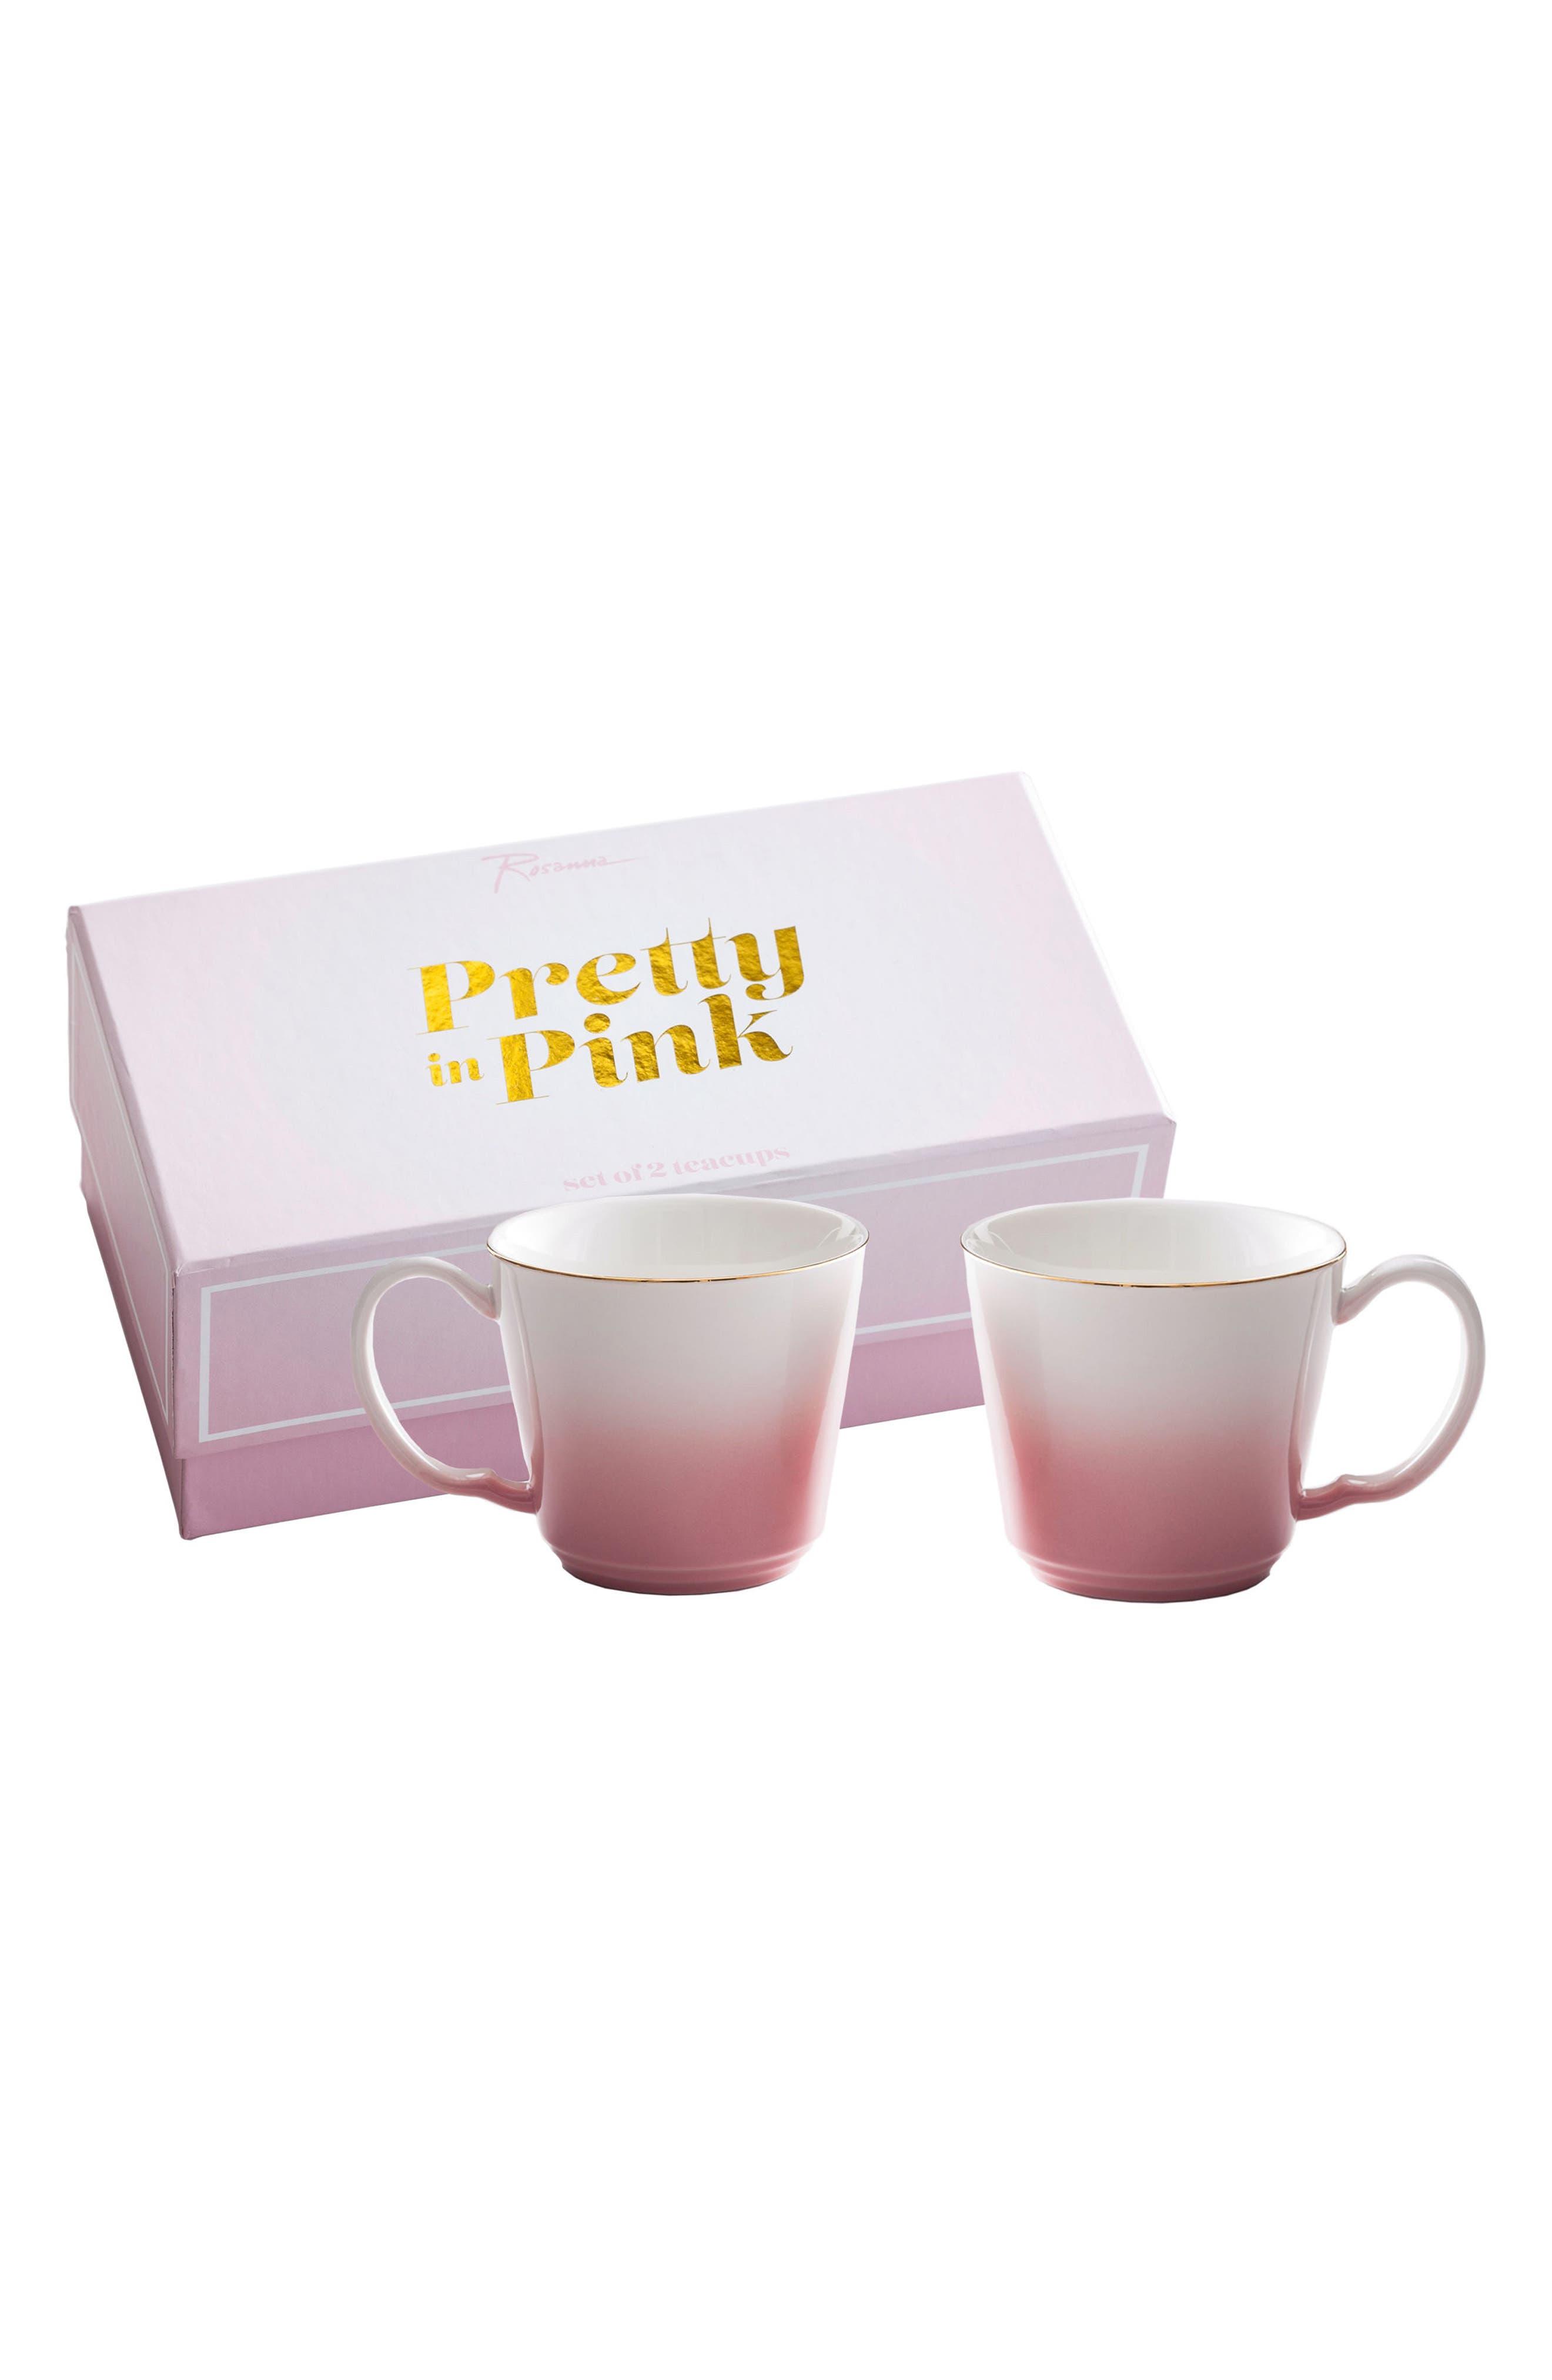 Main Image - Rosanna Pretty In Pink Set of 2 Porcelain Teacups